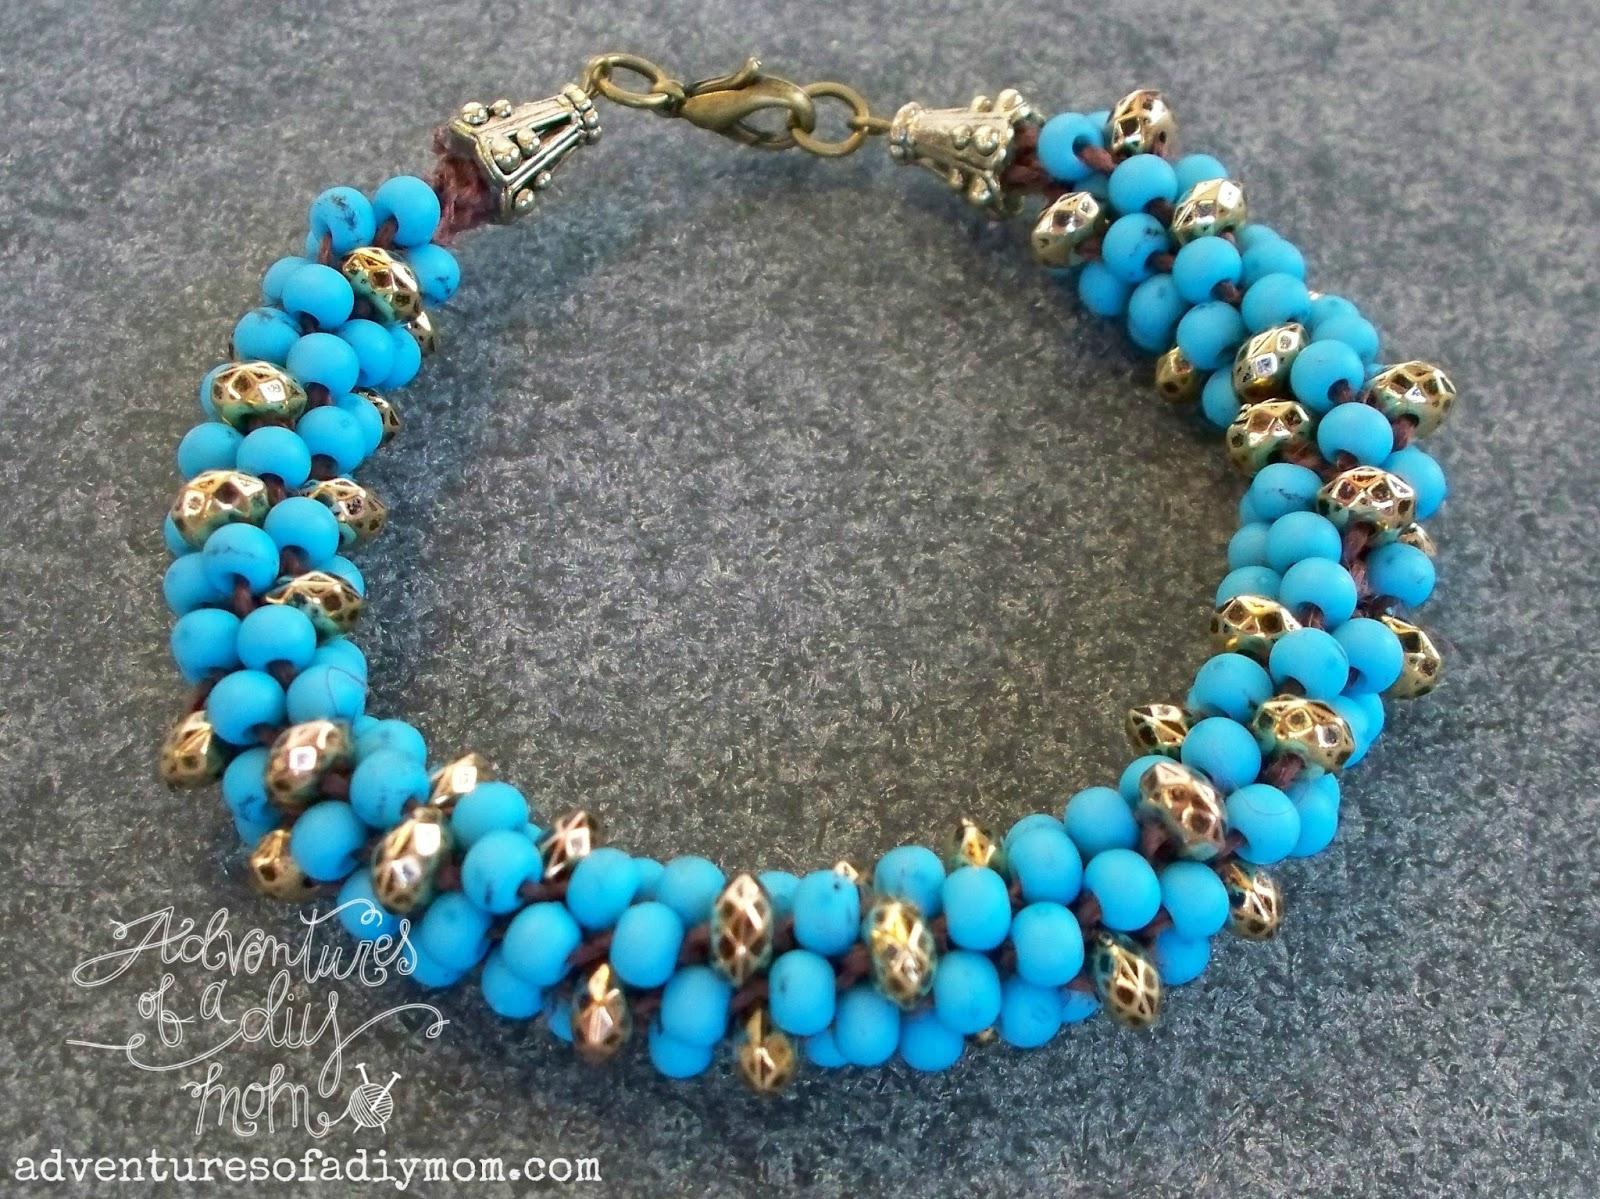 Kumihimo Beaded Bracelets Tutorial - Adventures of a DIY Mom